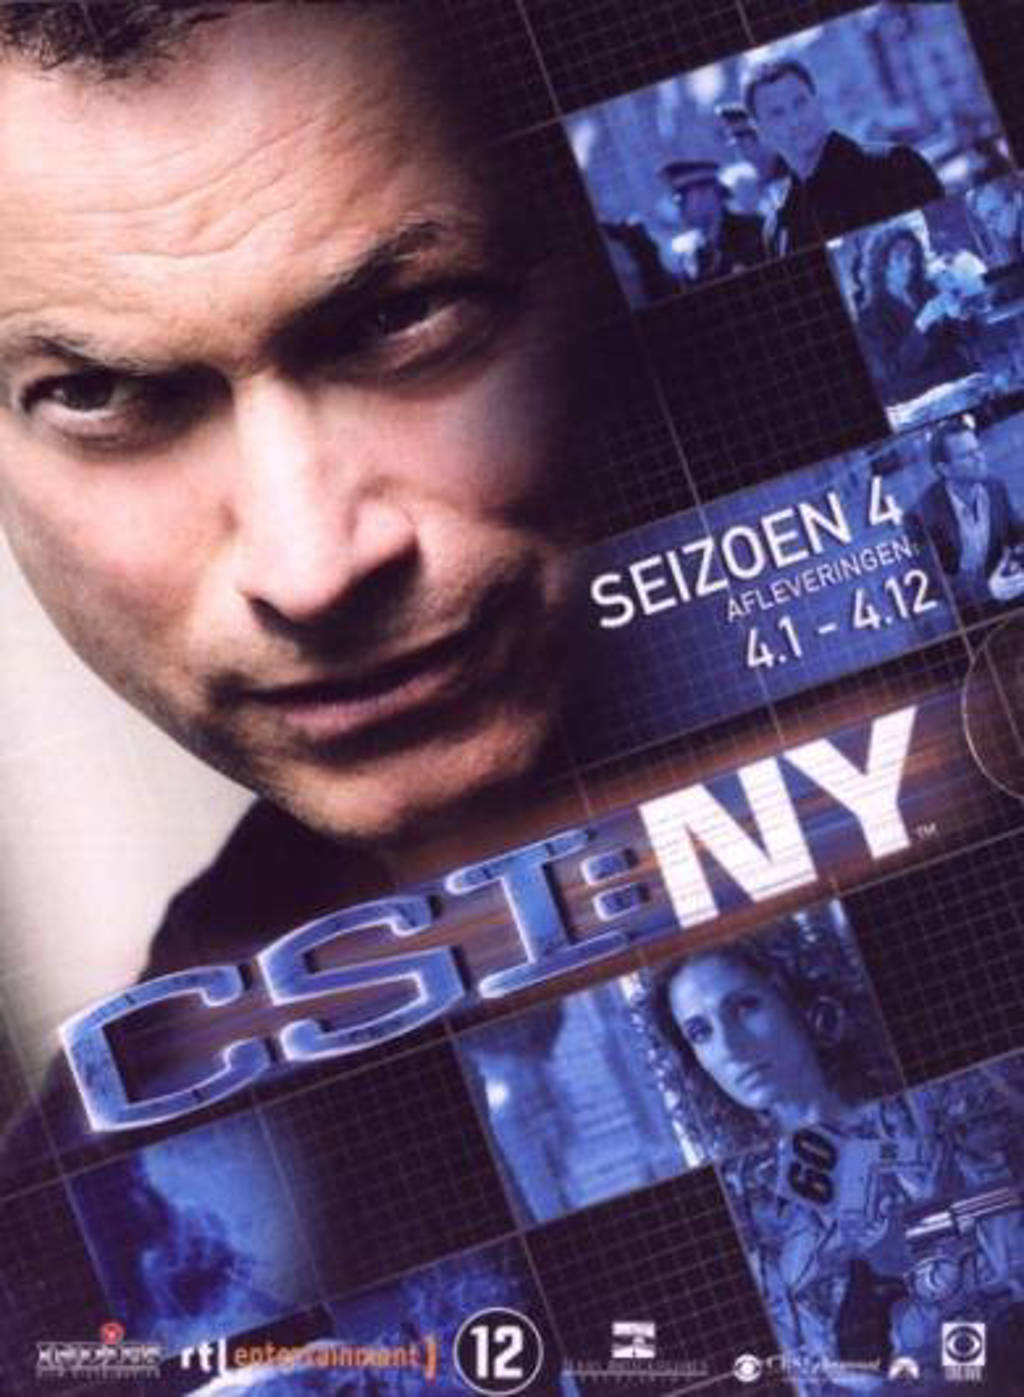 CSI New York - Seizoen 4 deel 1 (DVD)